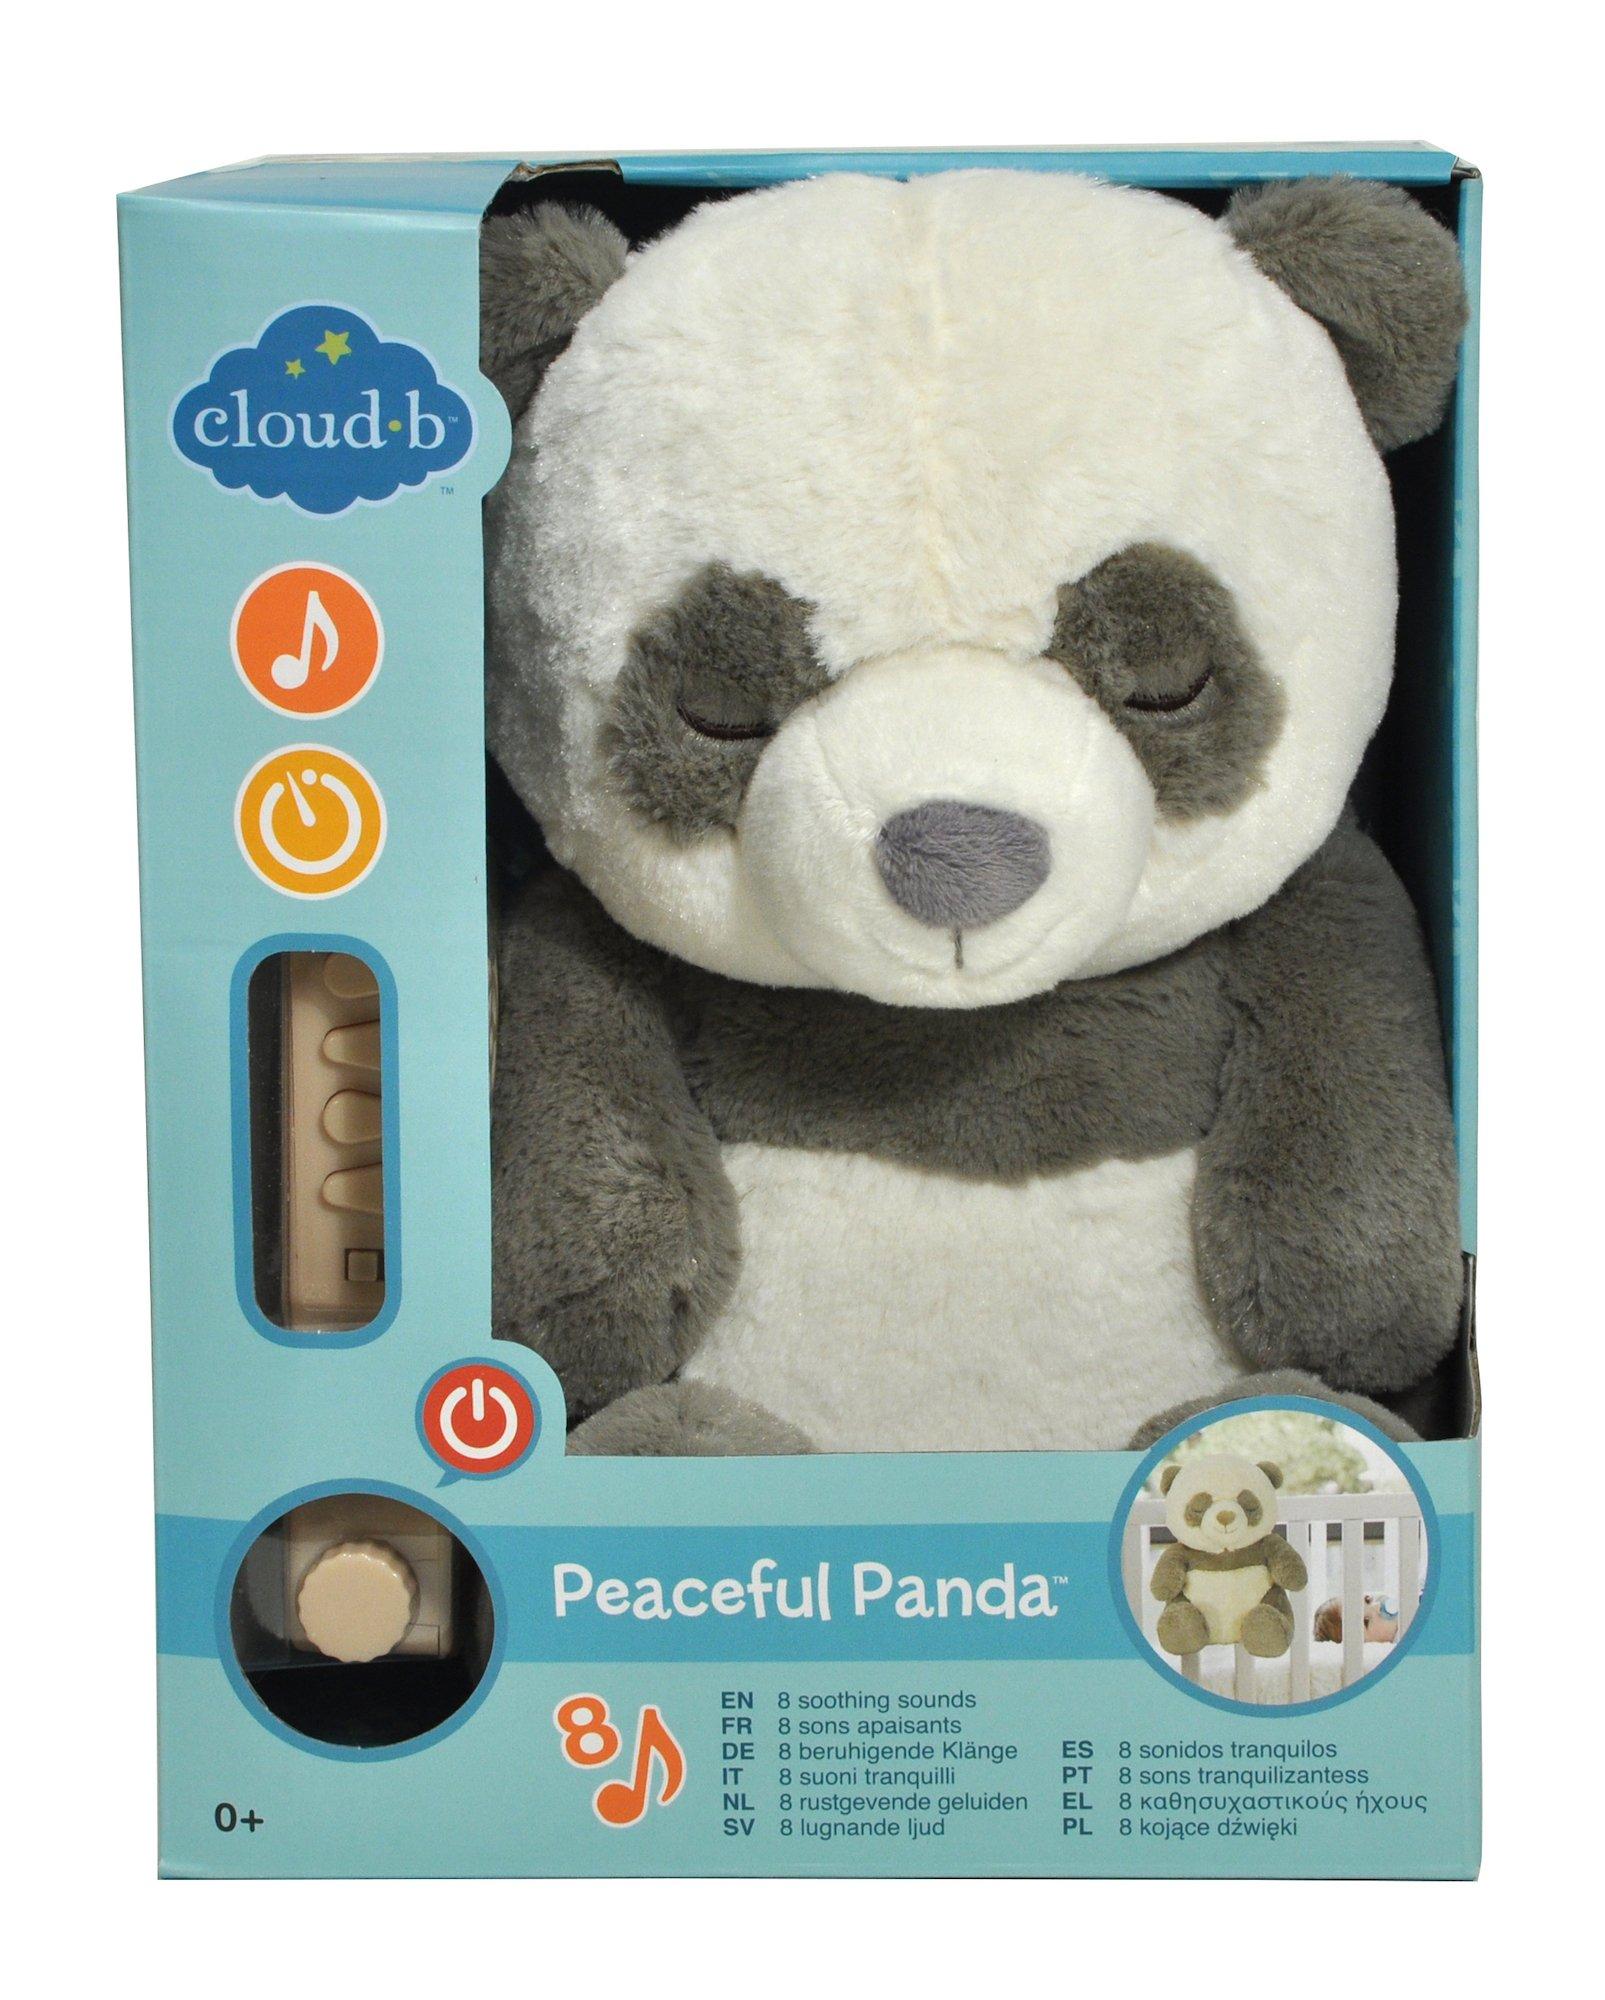 Cloud b Peaceful Panda White Noise Sound Machine